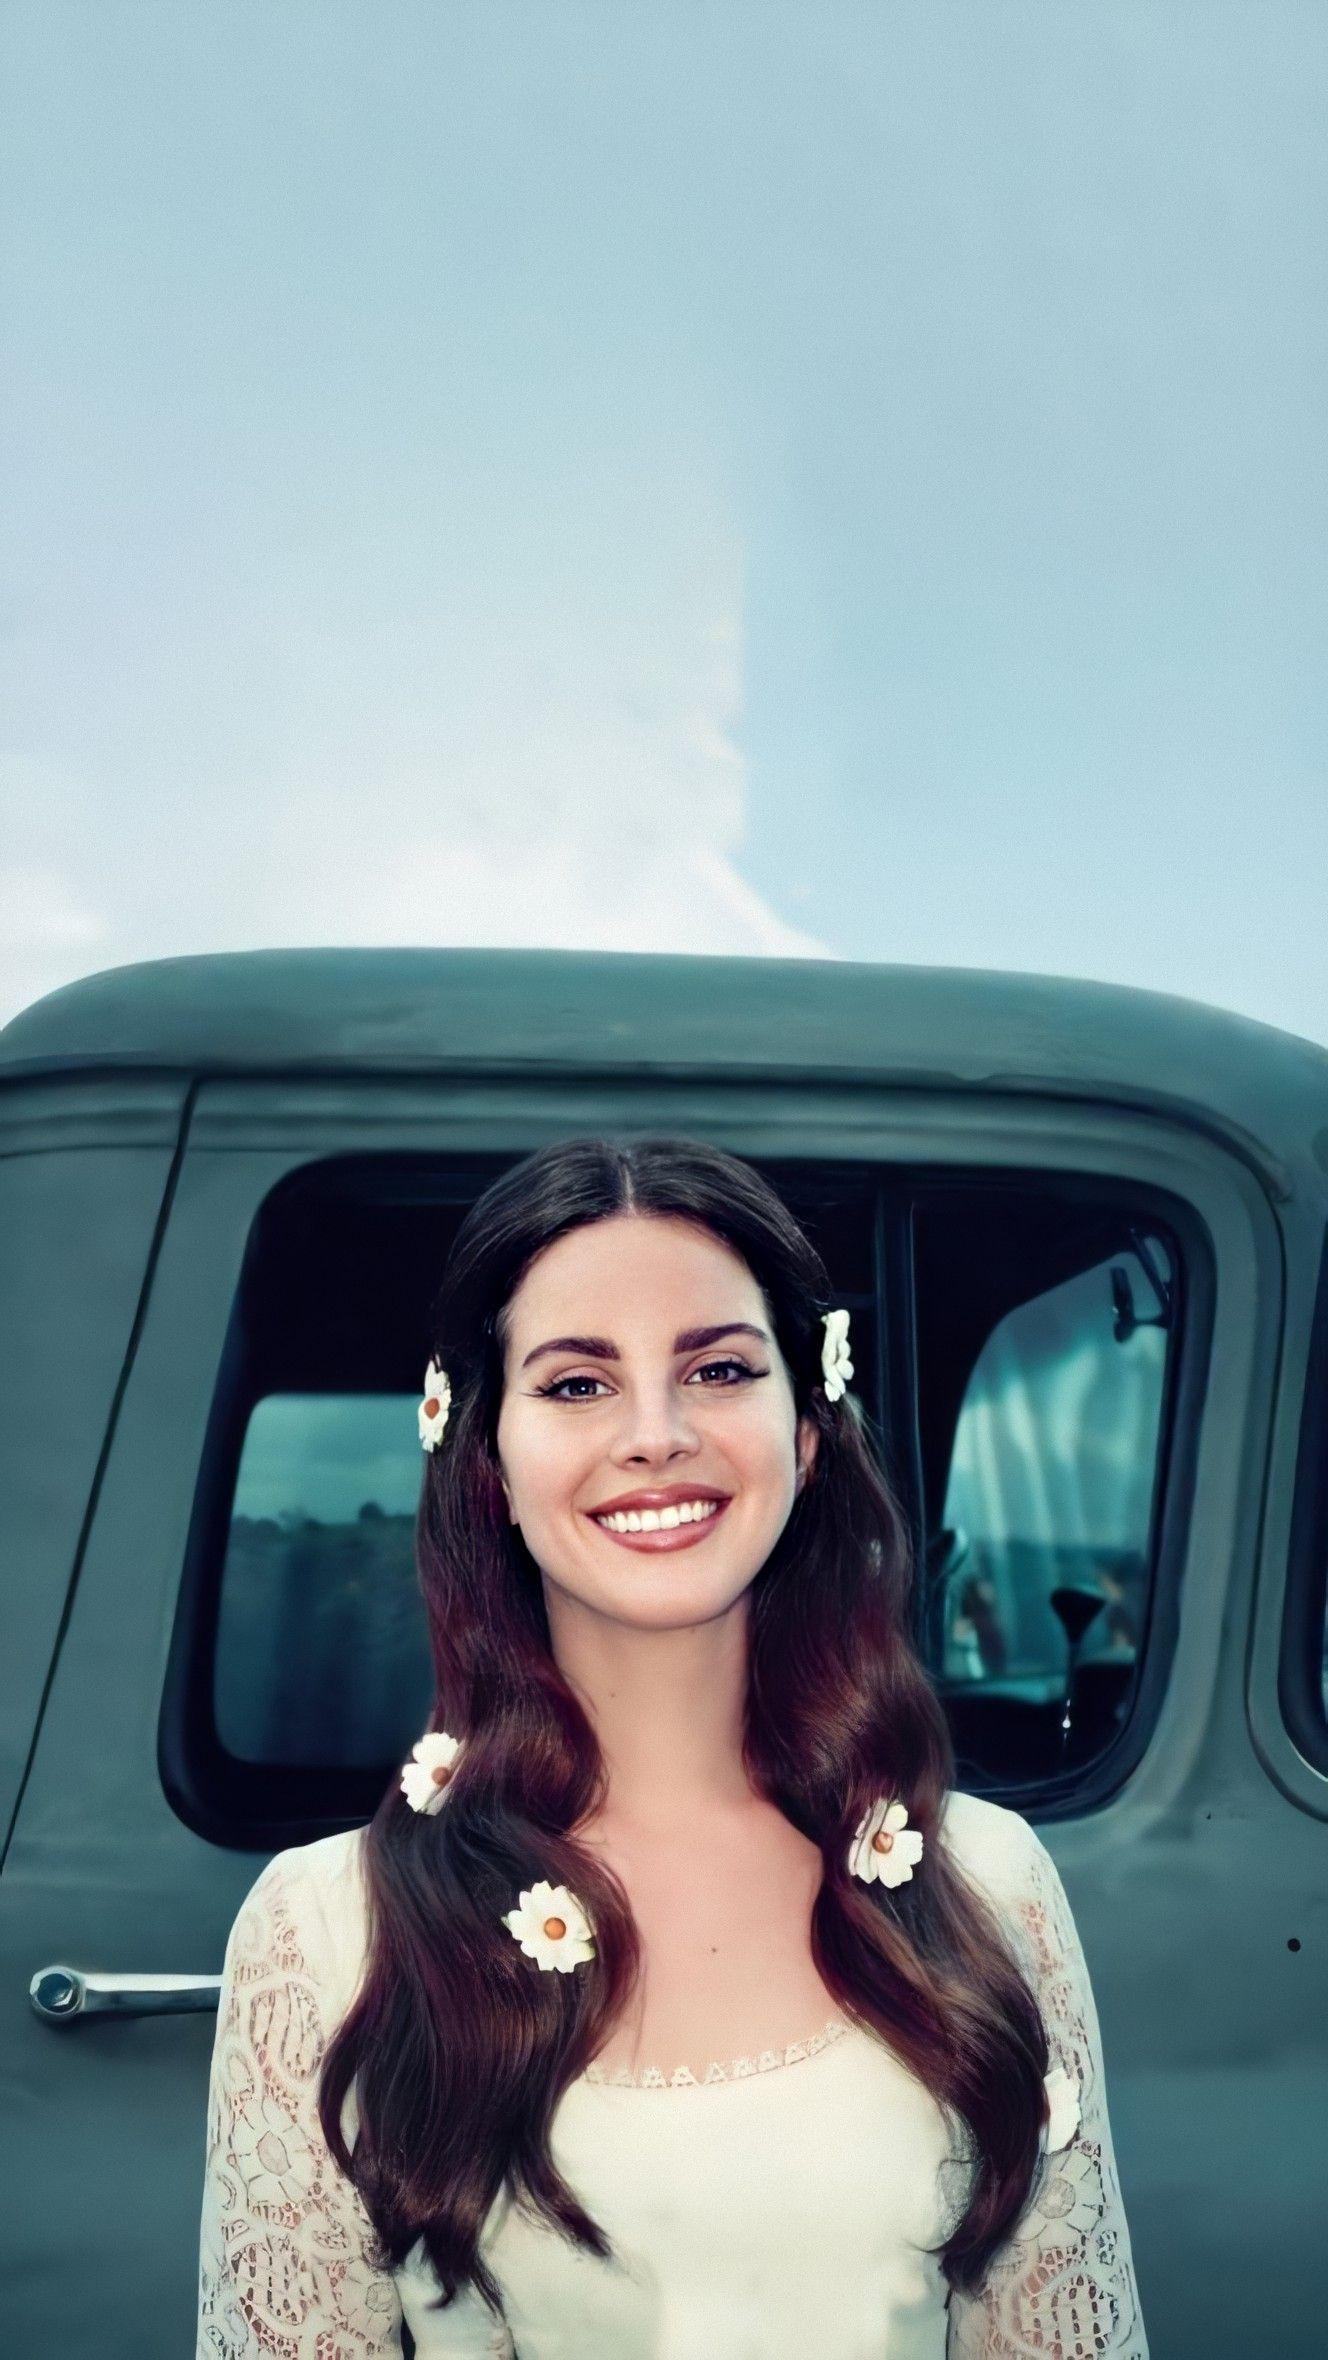 Lana Del Rey Wallpaper Lana Del Rey Lana Del Ray Lana Del